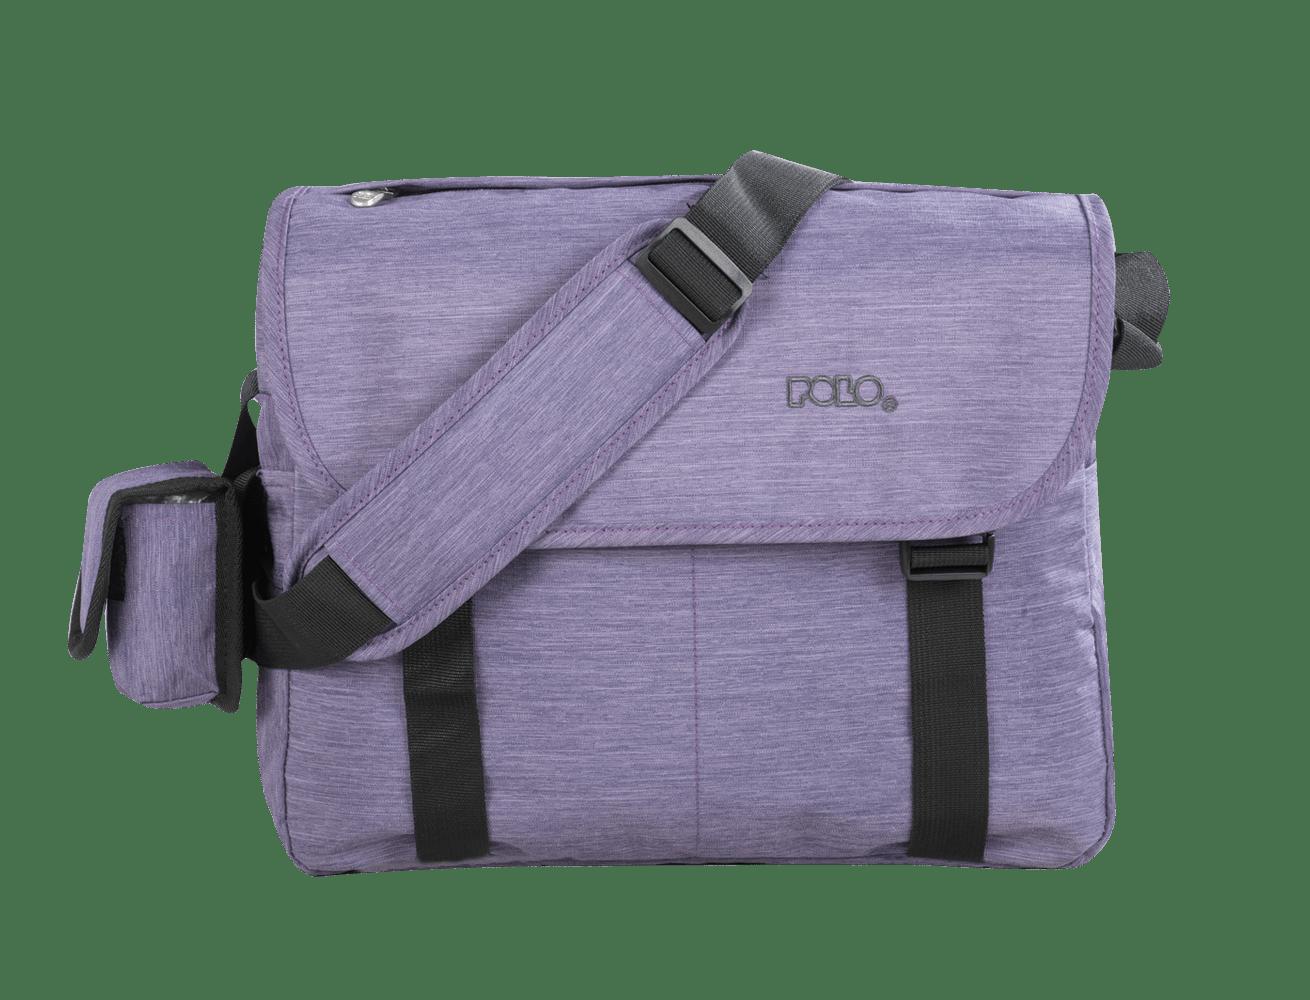 c041431b4a Τσάντα Polo Briefcase Χαρτοφύλακας - 9-07-718-93 - Lexicon Shop